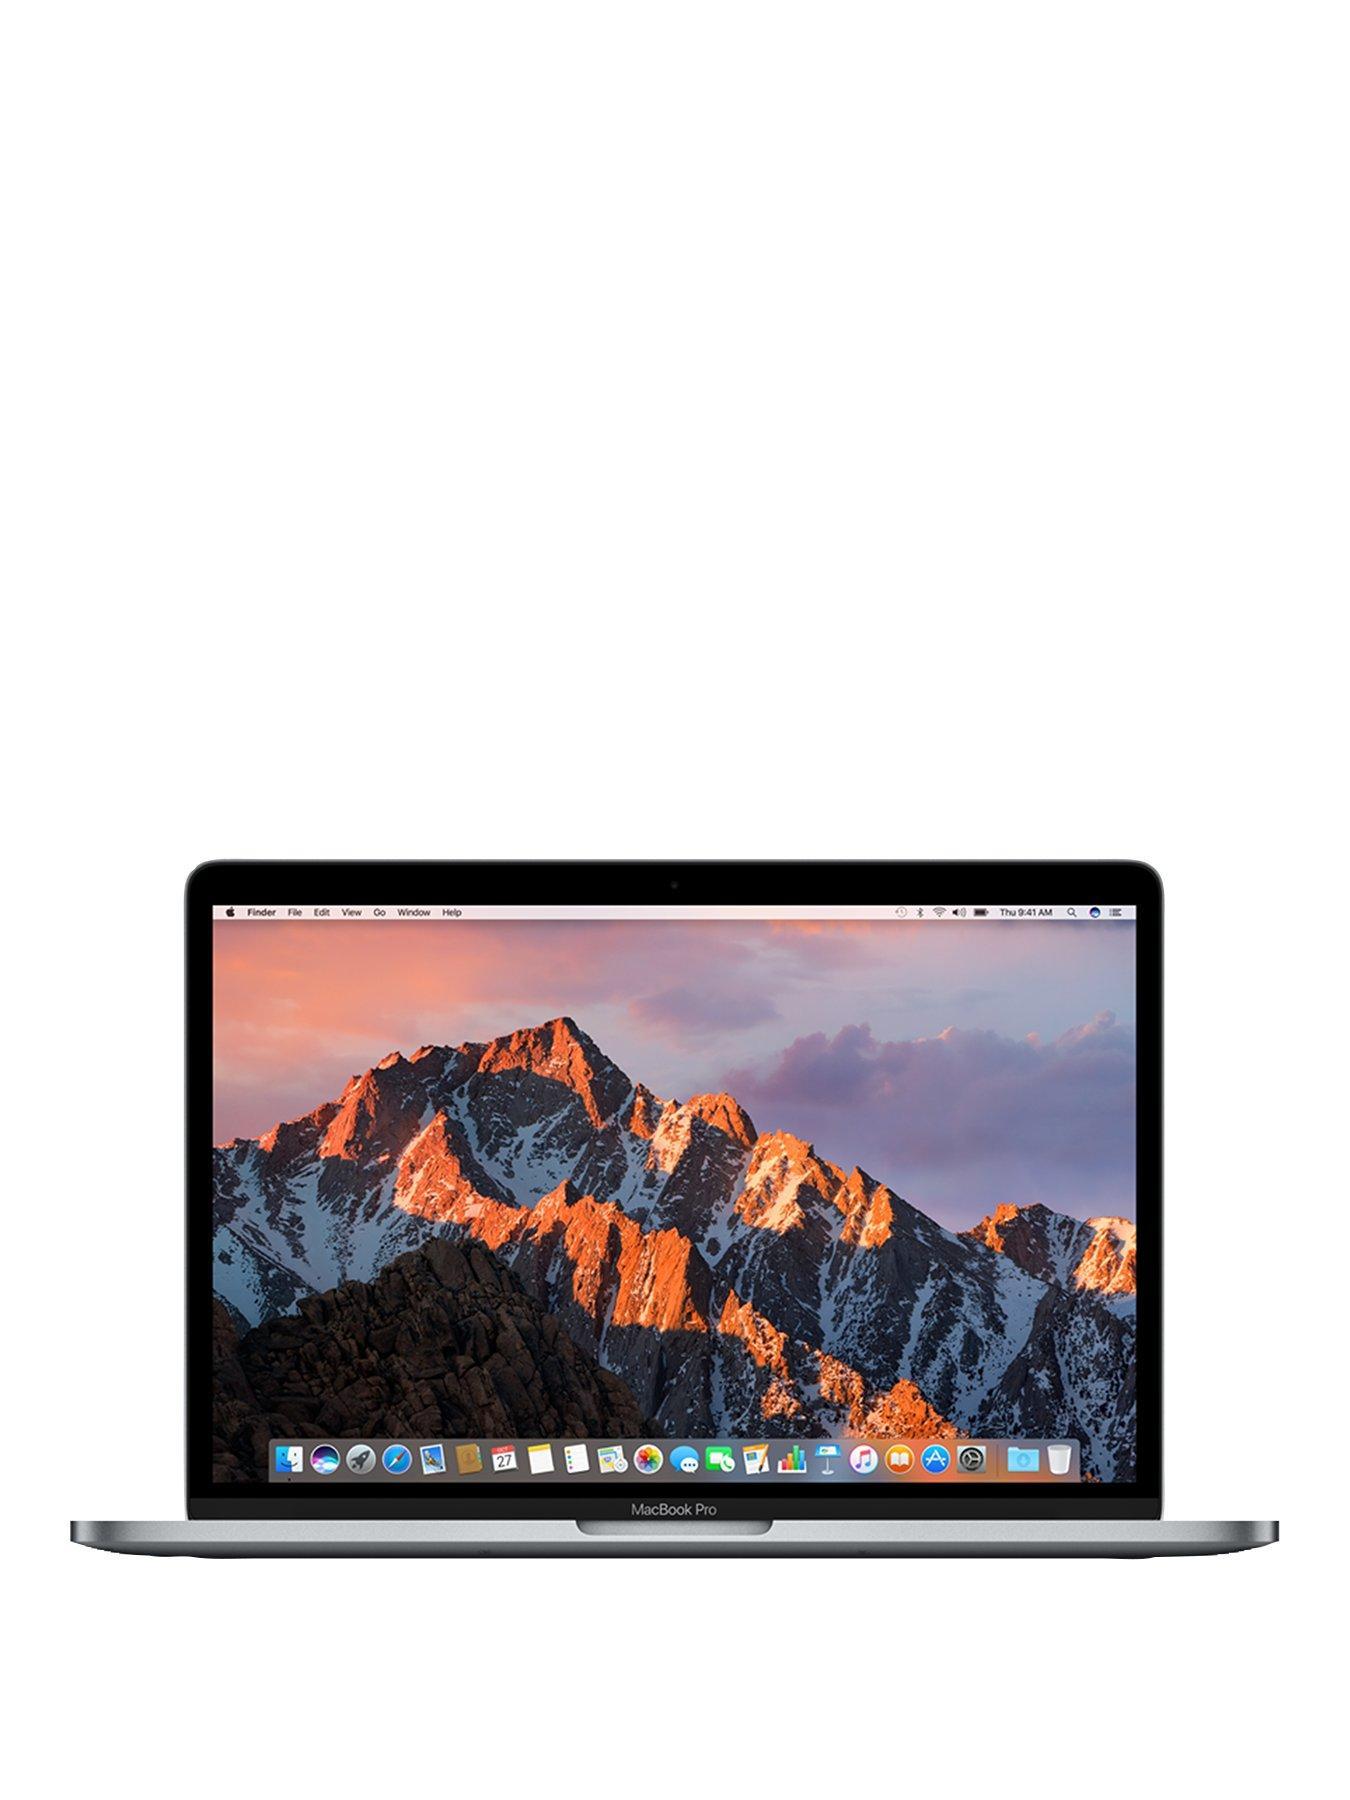 Apple MacBook Pro (2017) 13-inch, i5, 8GB RAM, 128GB SSD £999 BNPL / code @ Very